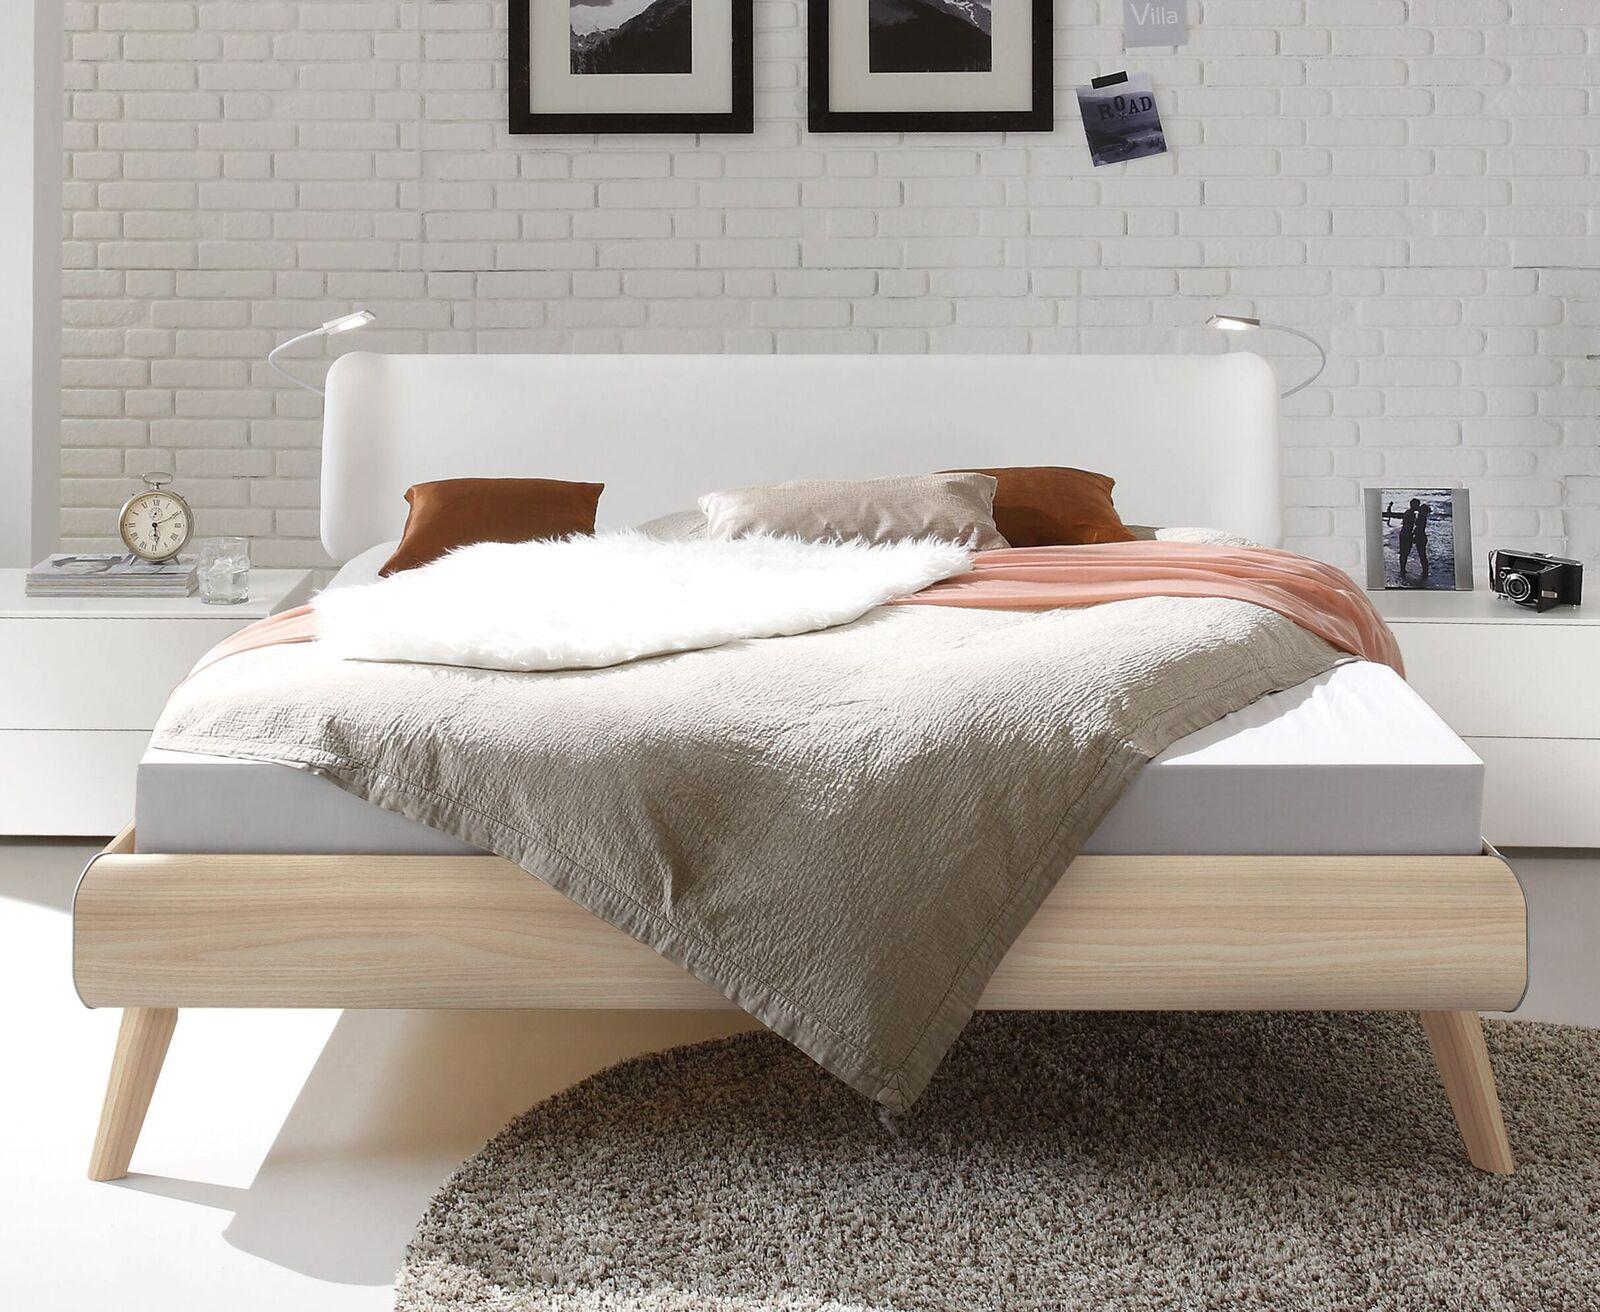 bett im skandinavischen design mit kunstleder kopfteil labrea. Black Bedroom Furniture Sets. Home Design Ideas